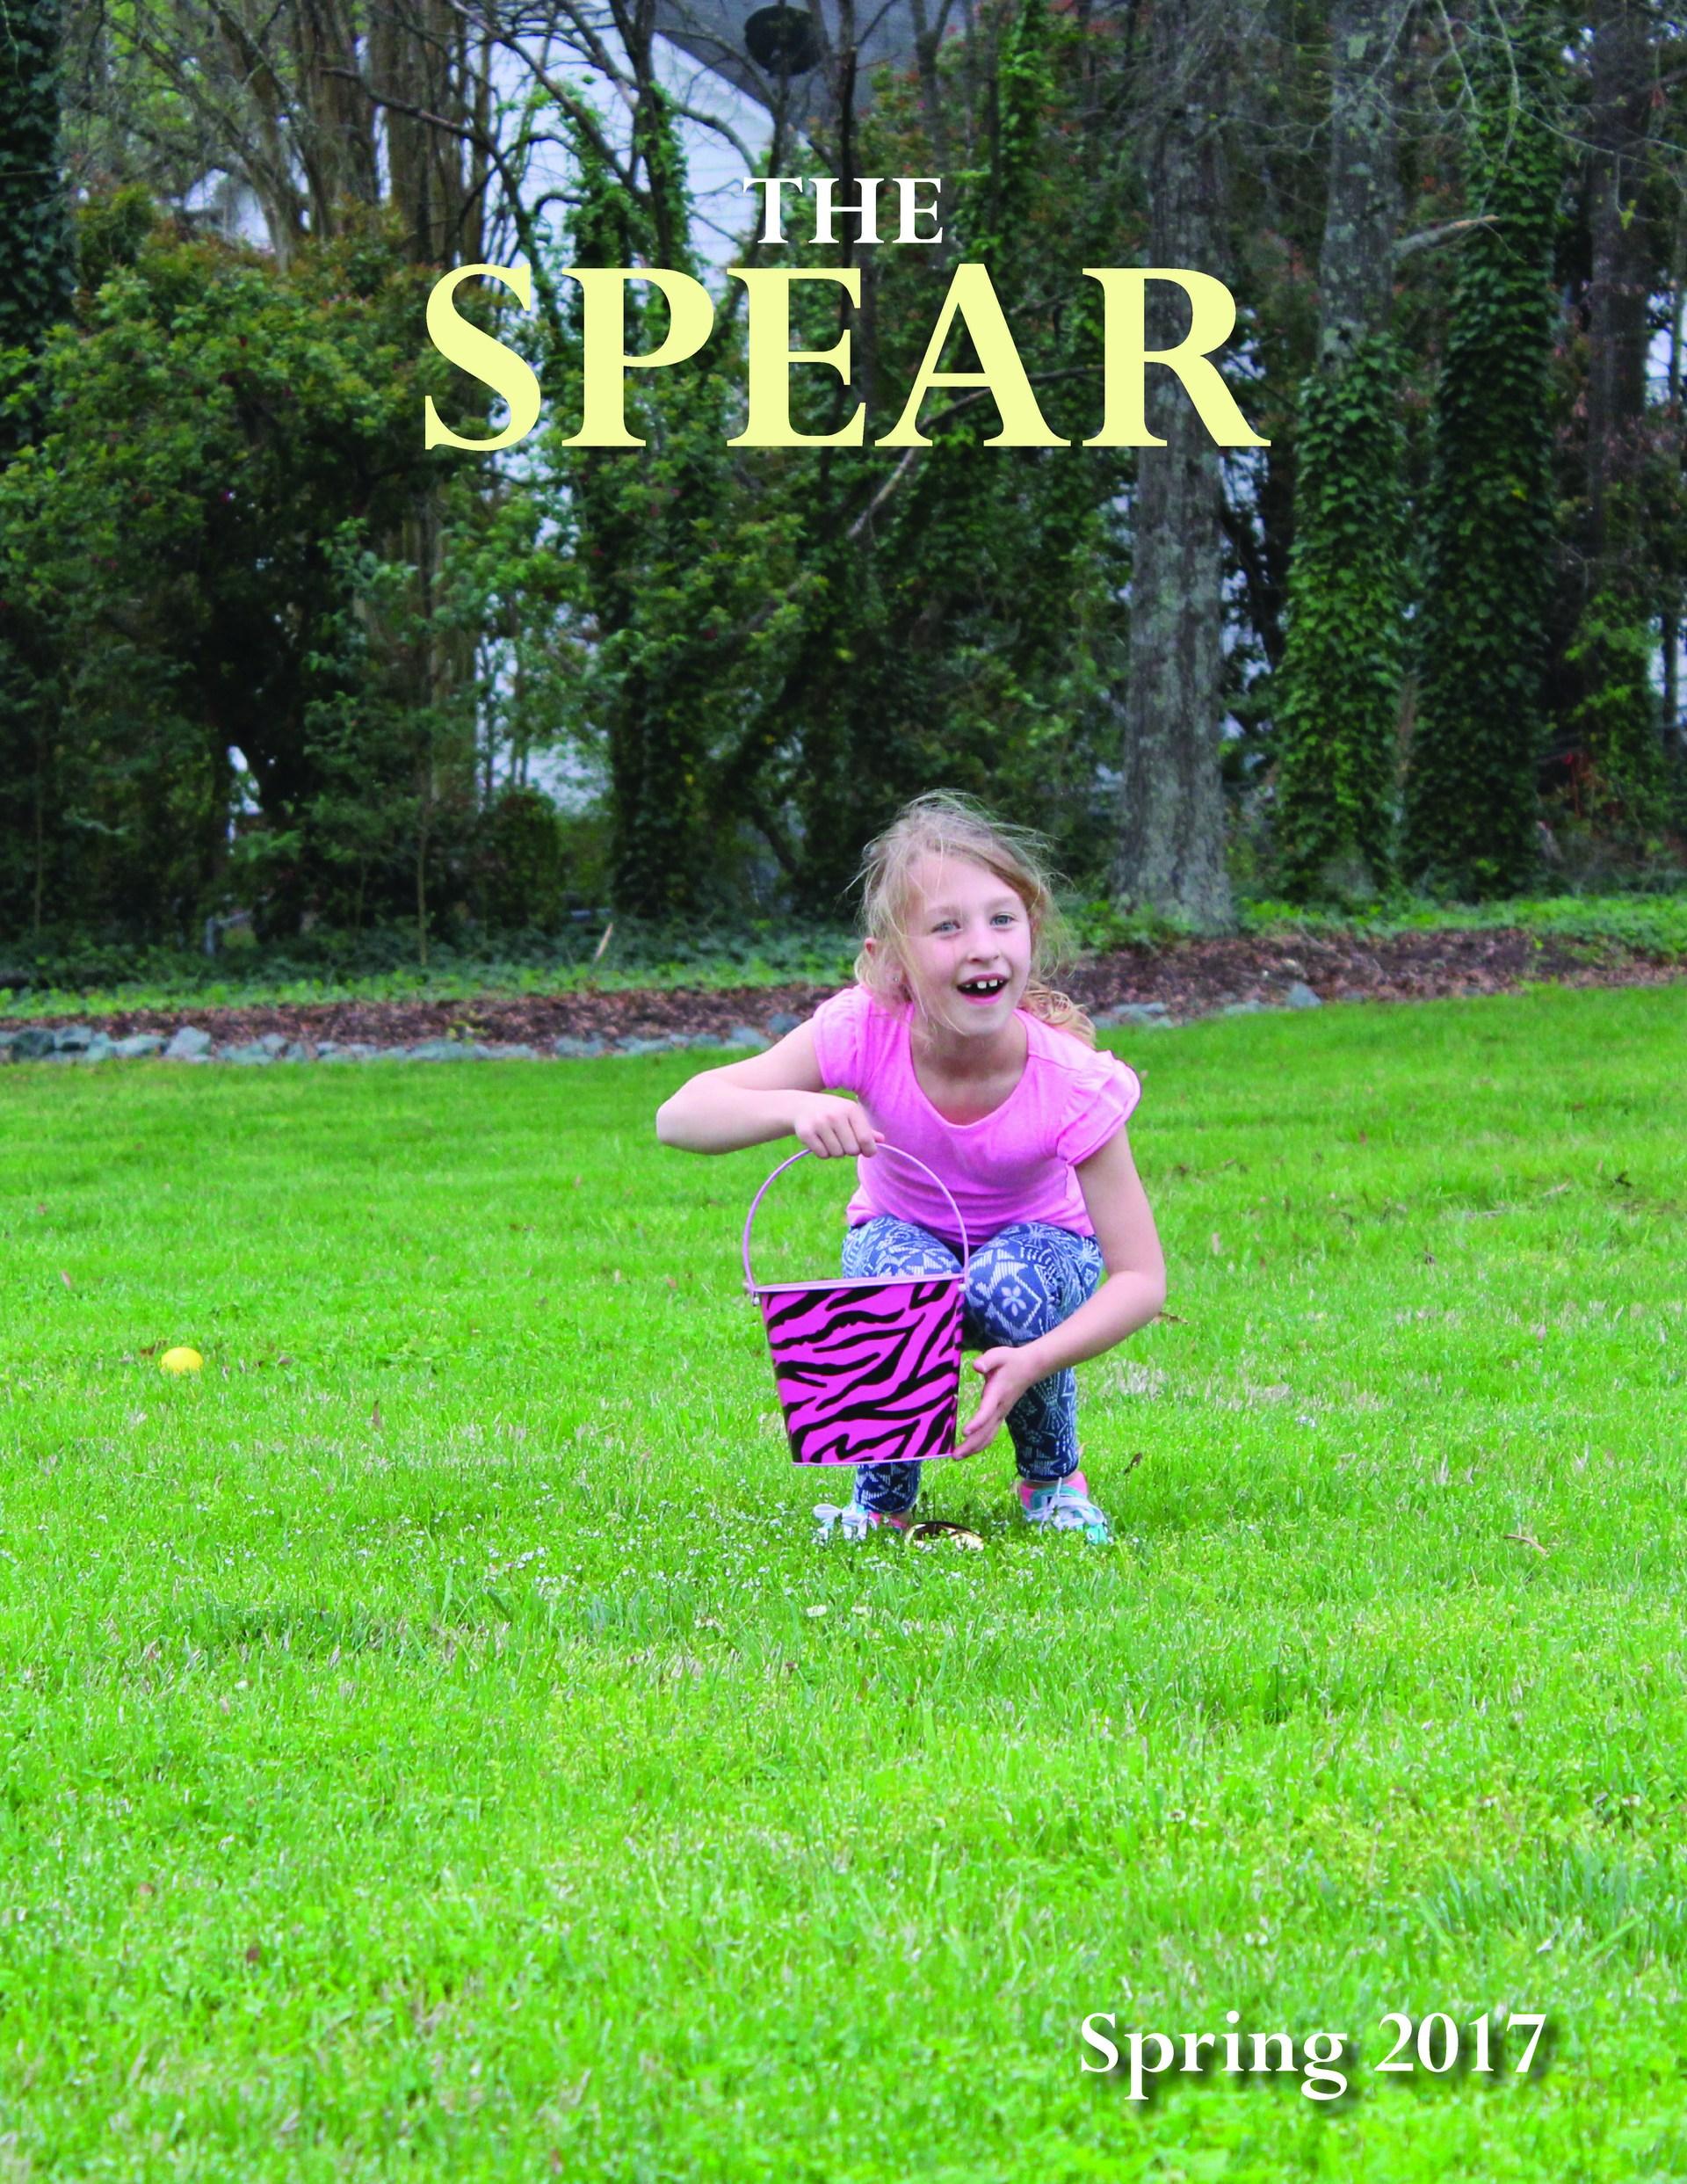 Spring Spear Cover